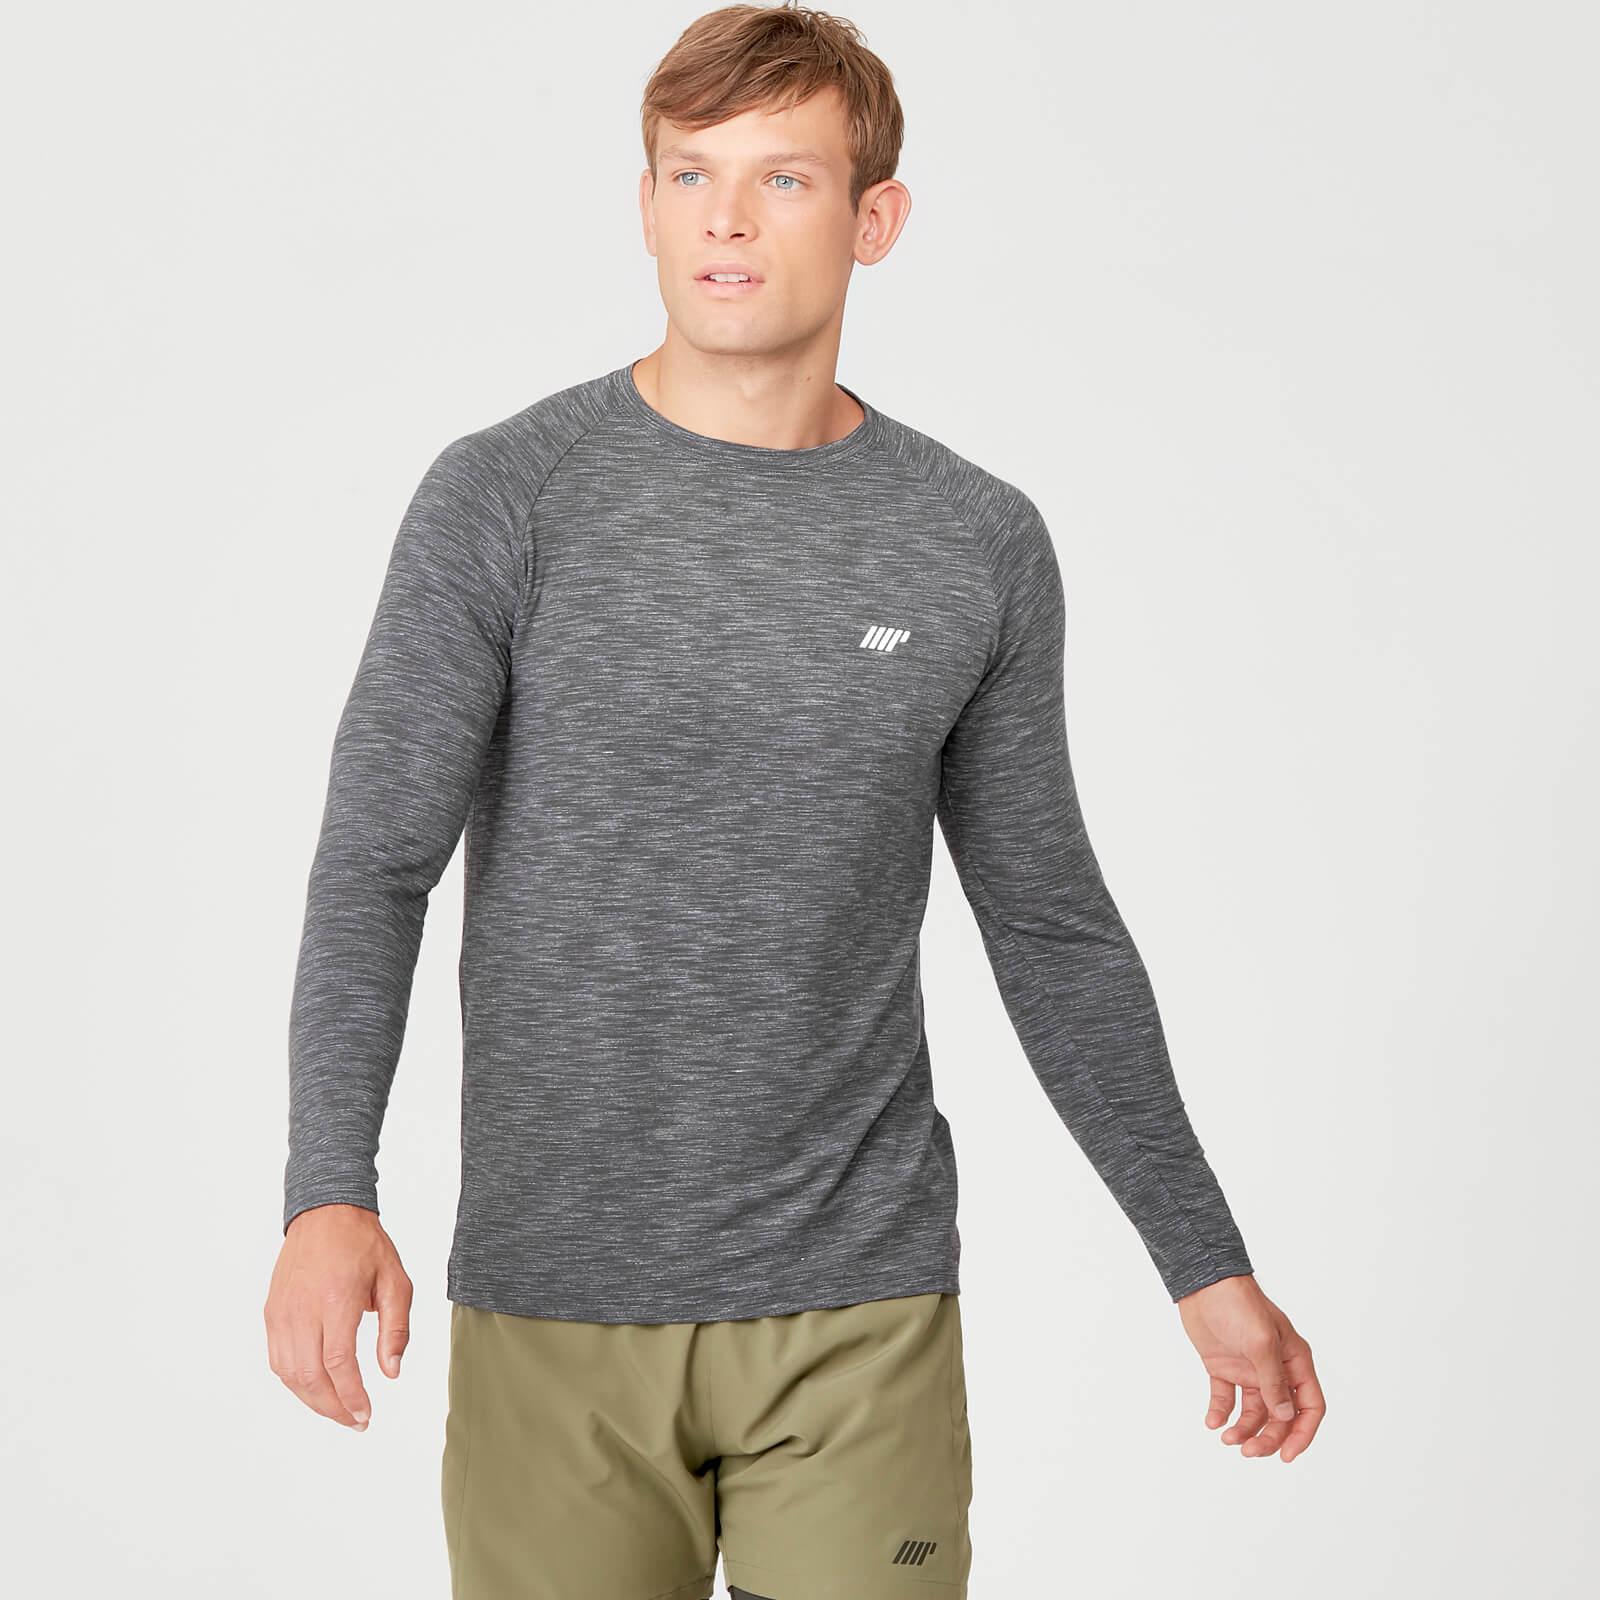 Myprotein Performance Long-Sleeve T-Shirt - Black Marl - XL